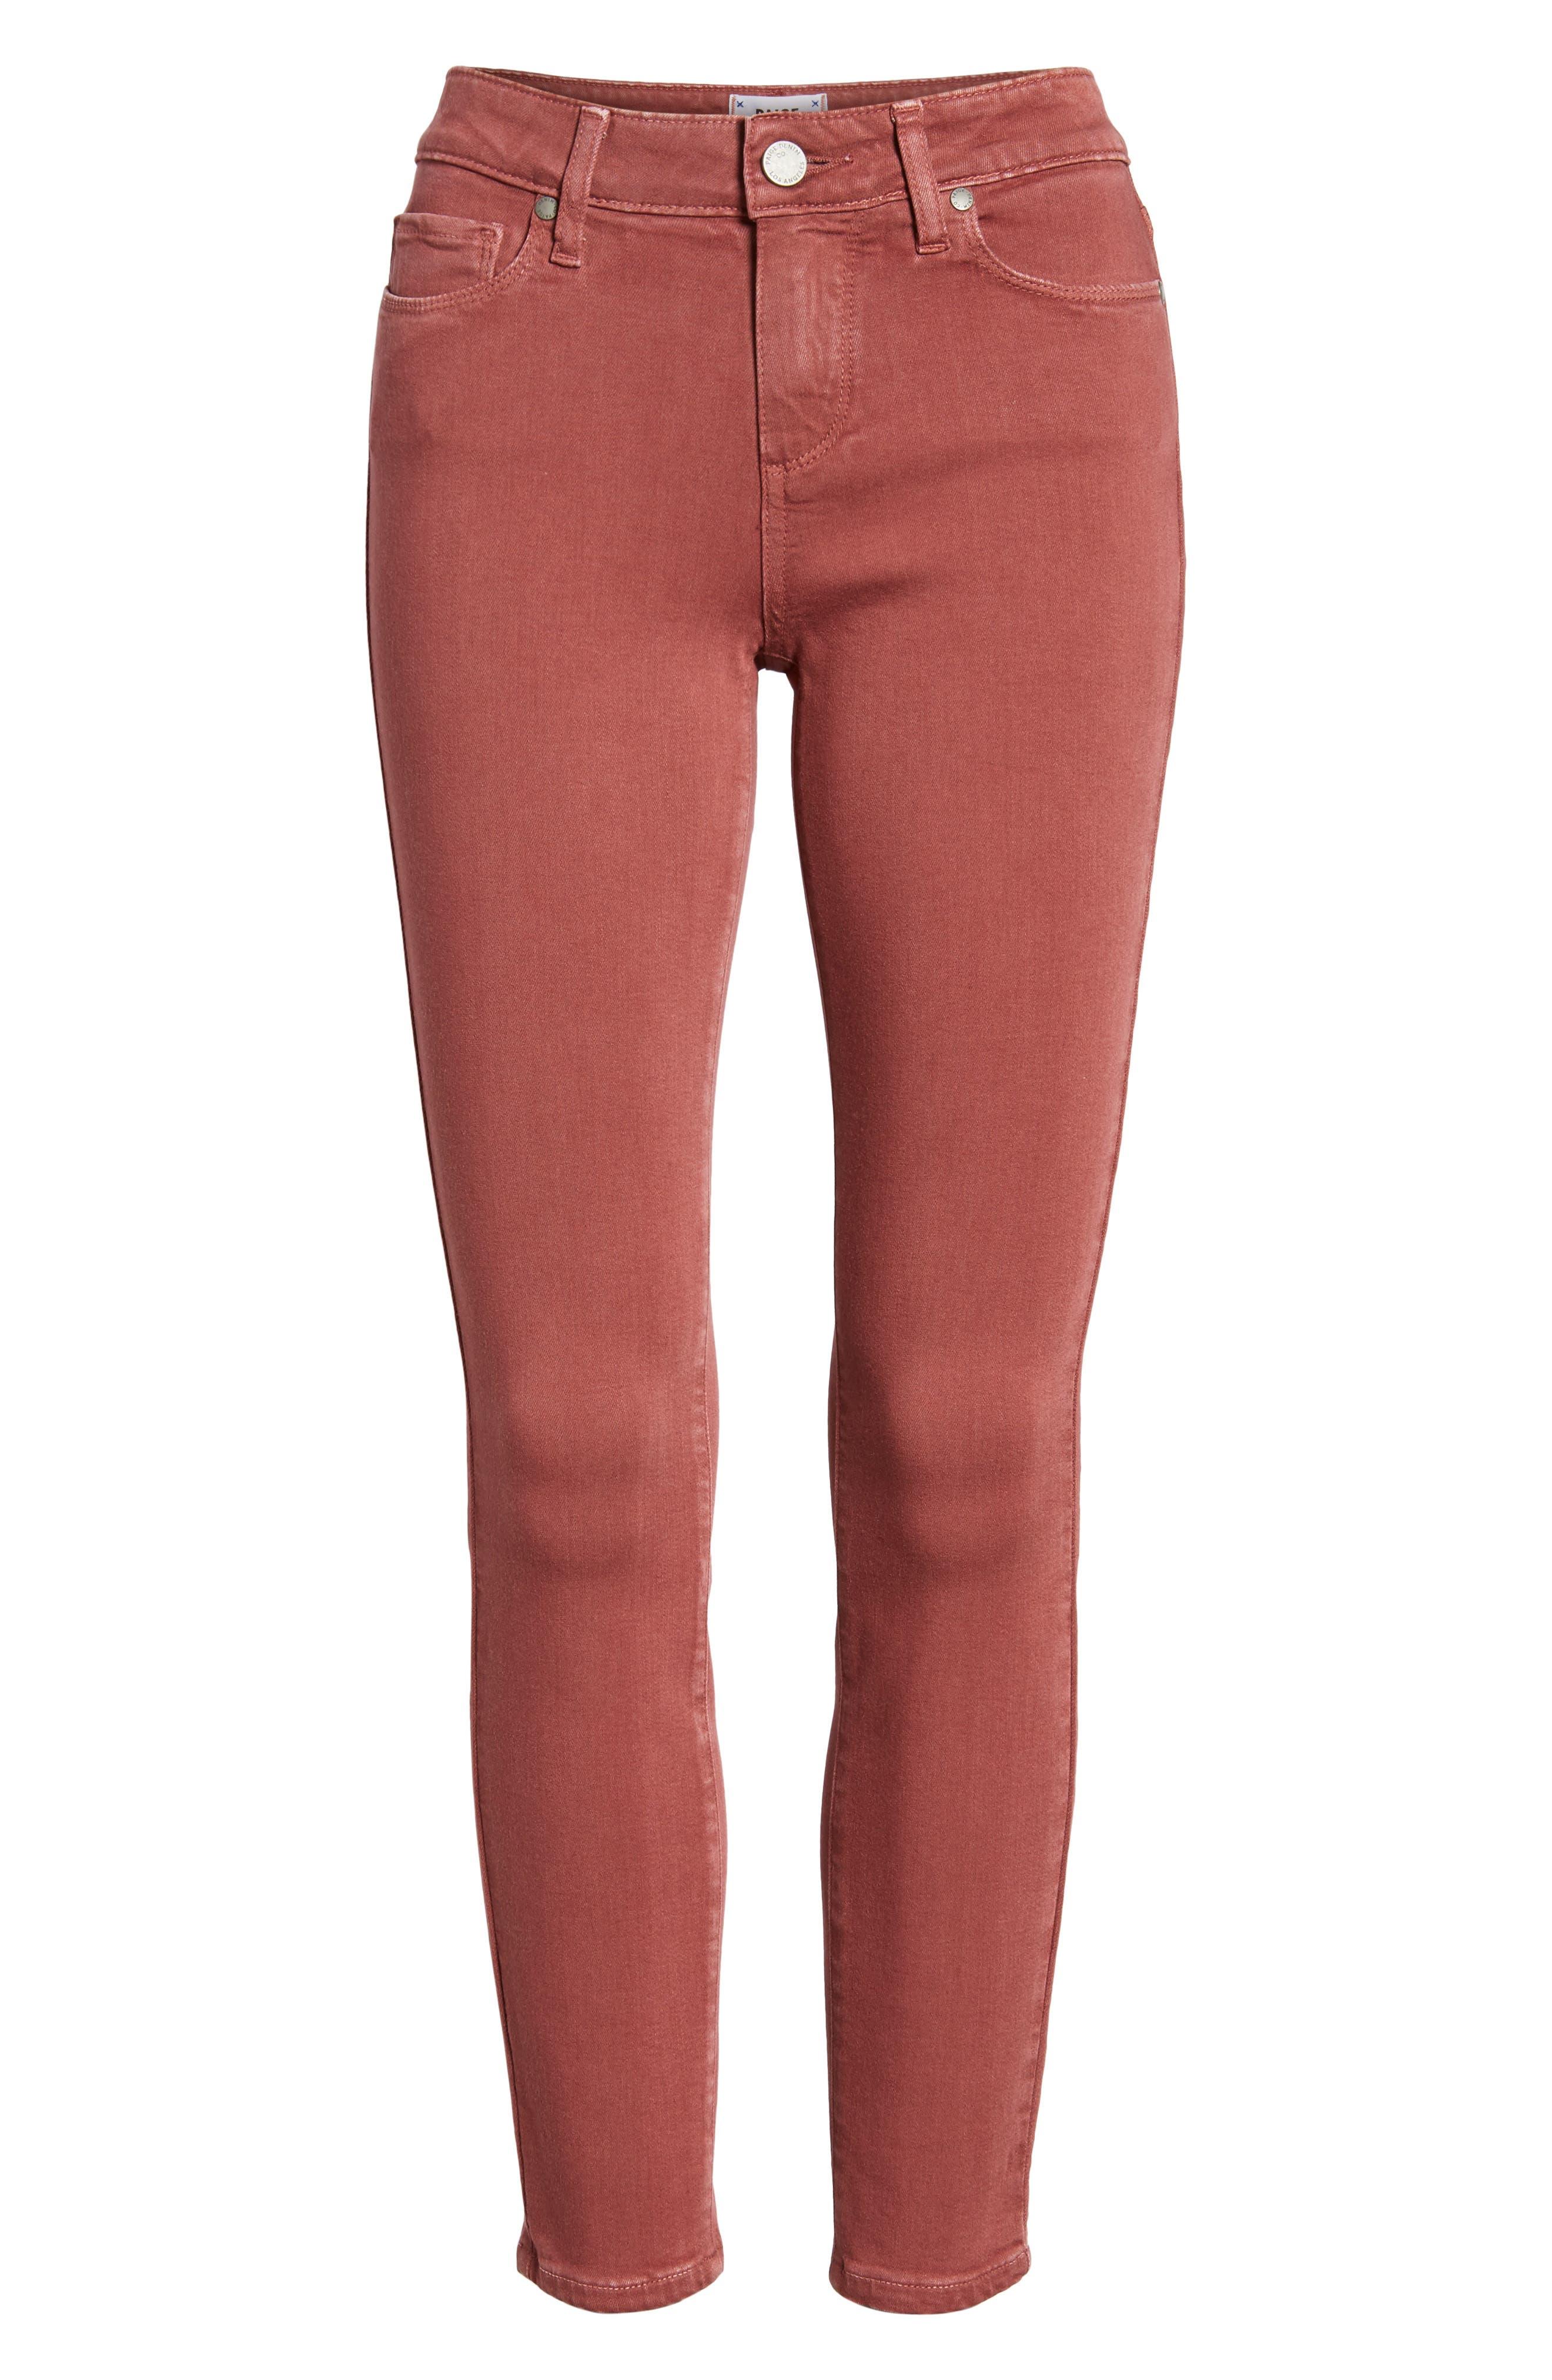 Verdugo Ankle Ultra Skinny Jeans,                             Alternate thumbnail 7, color,